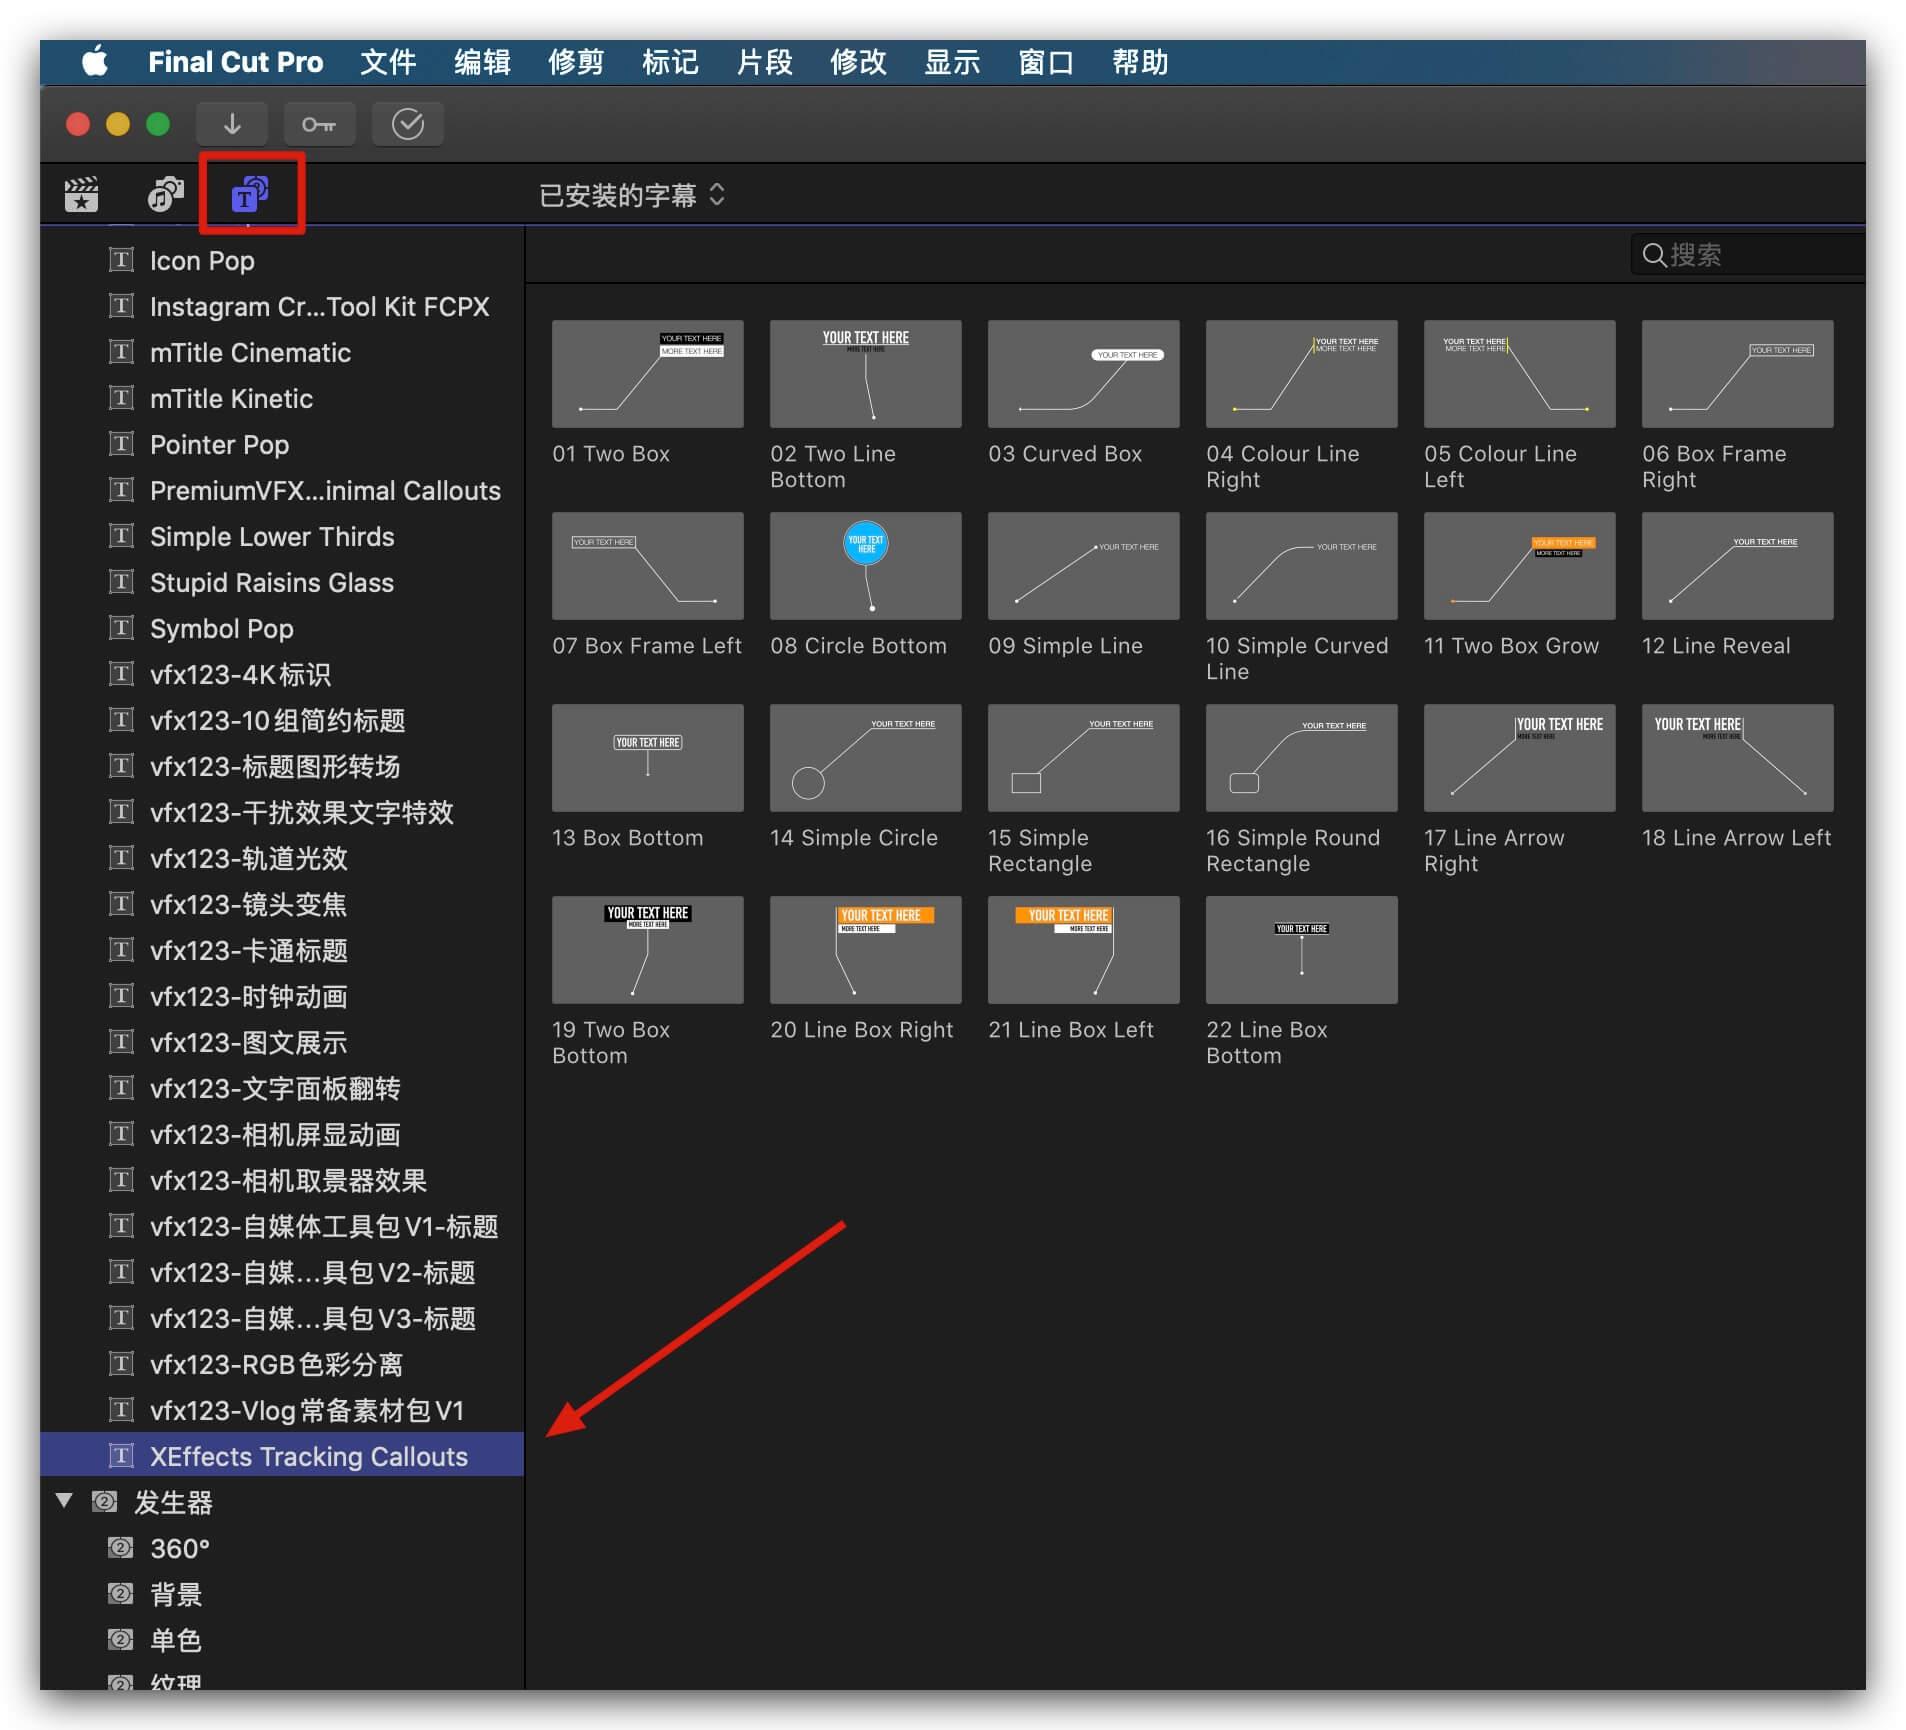 fcpx插件 22组简洁线条呼出标注注释重点标题动画可自动跟踪对象 Tracking Callouts